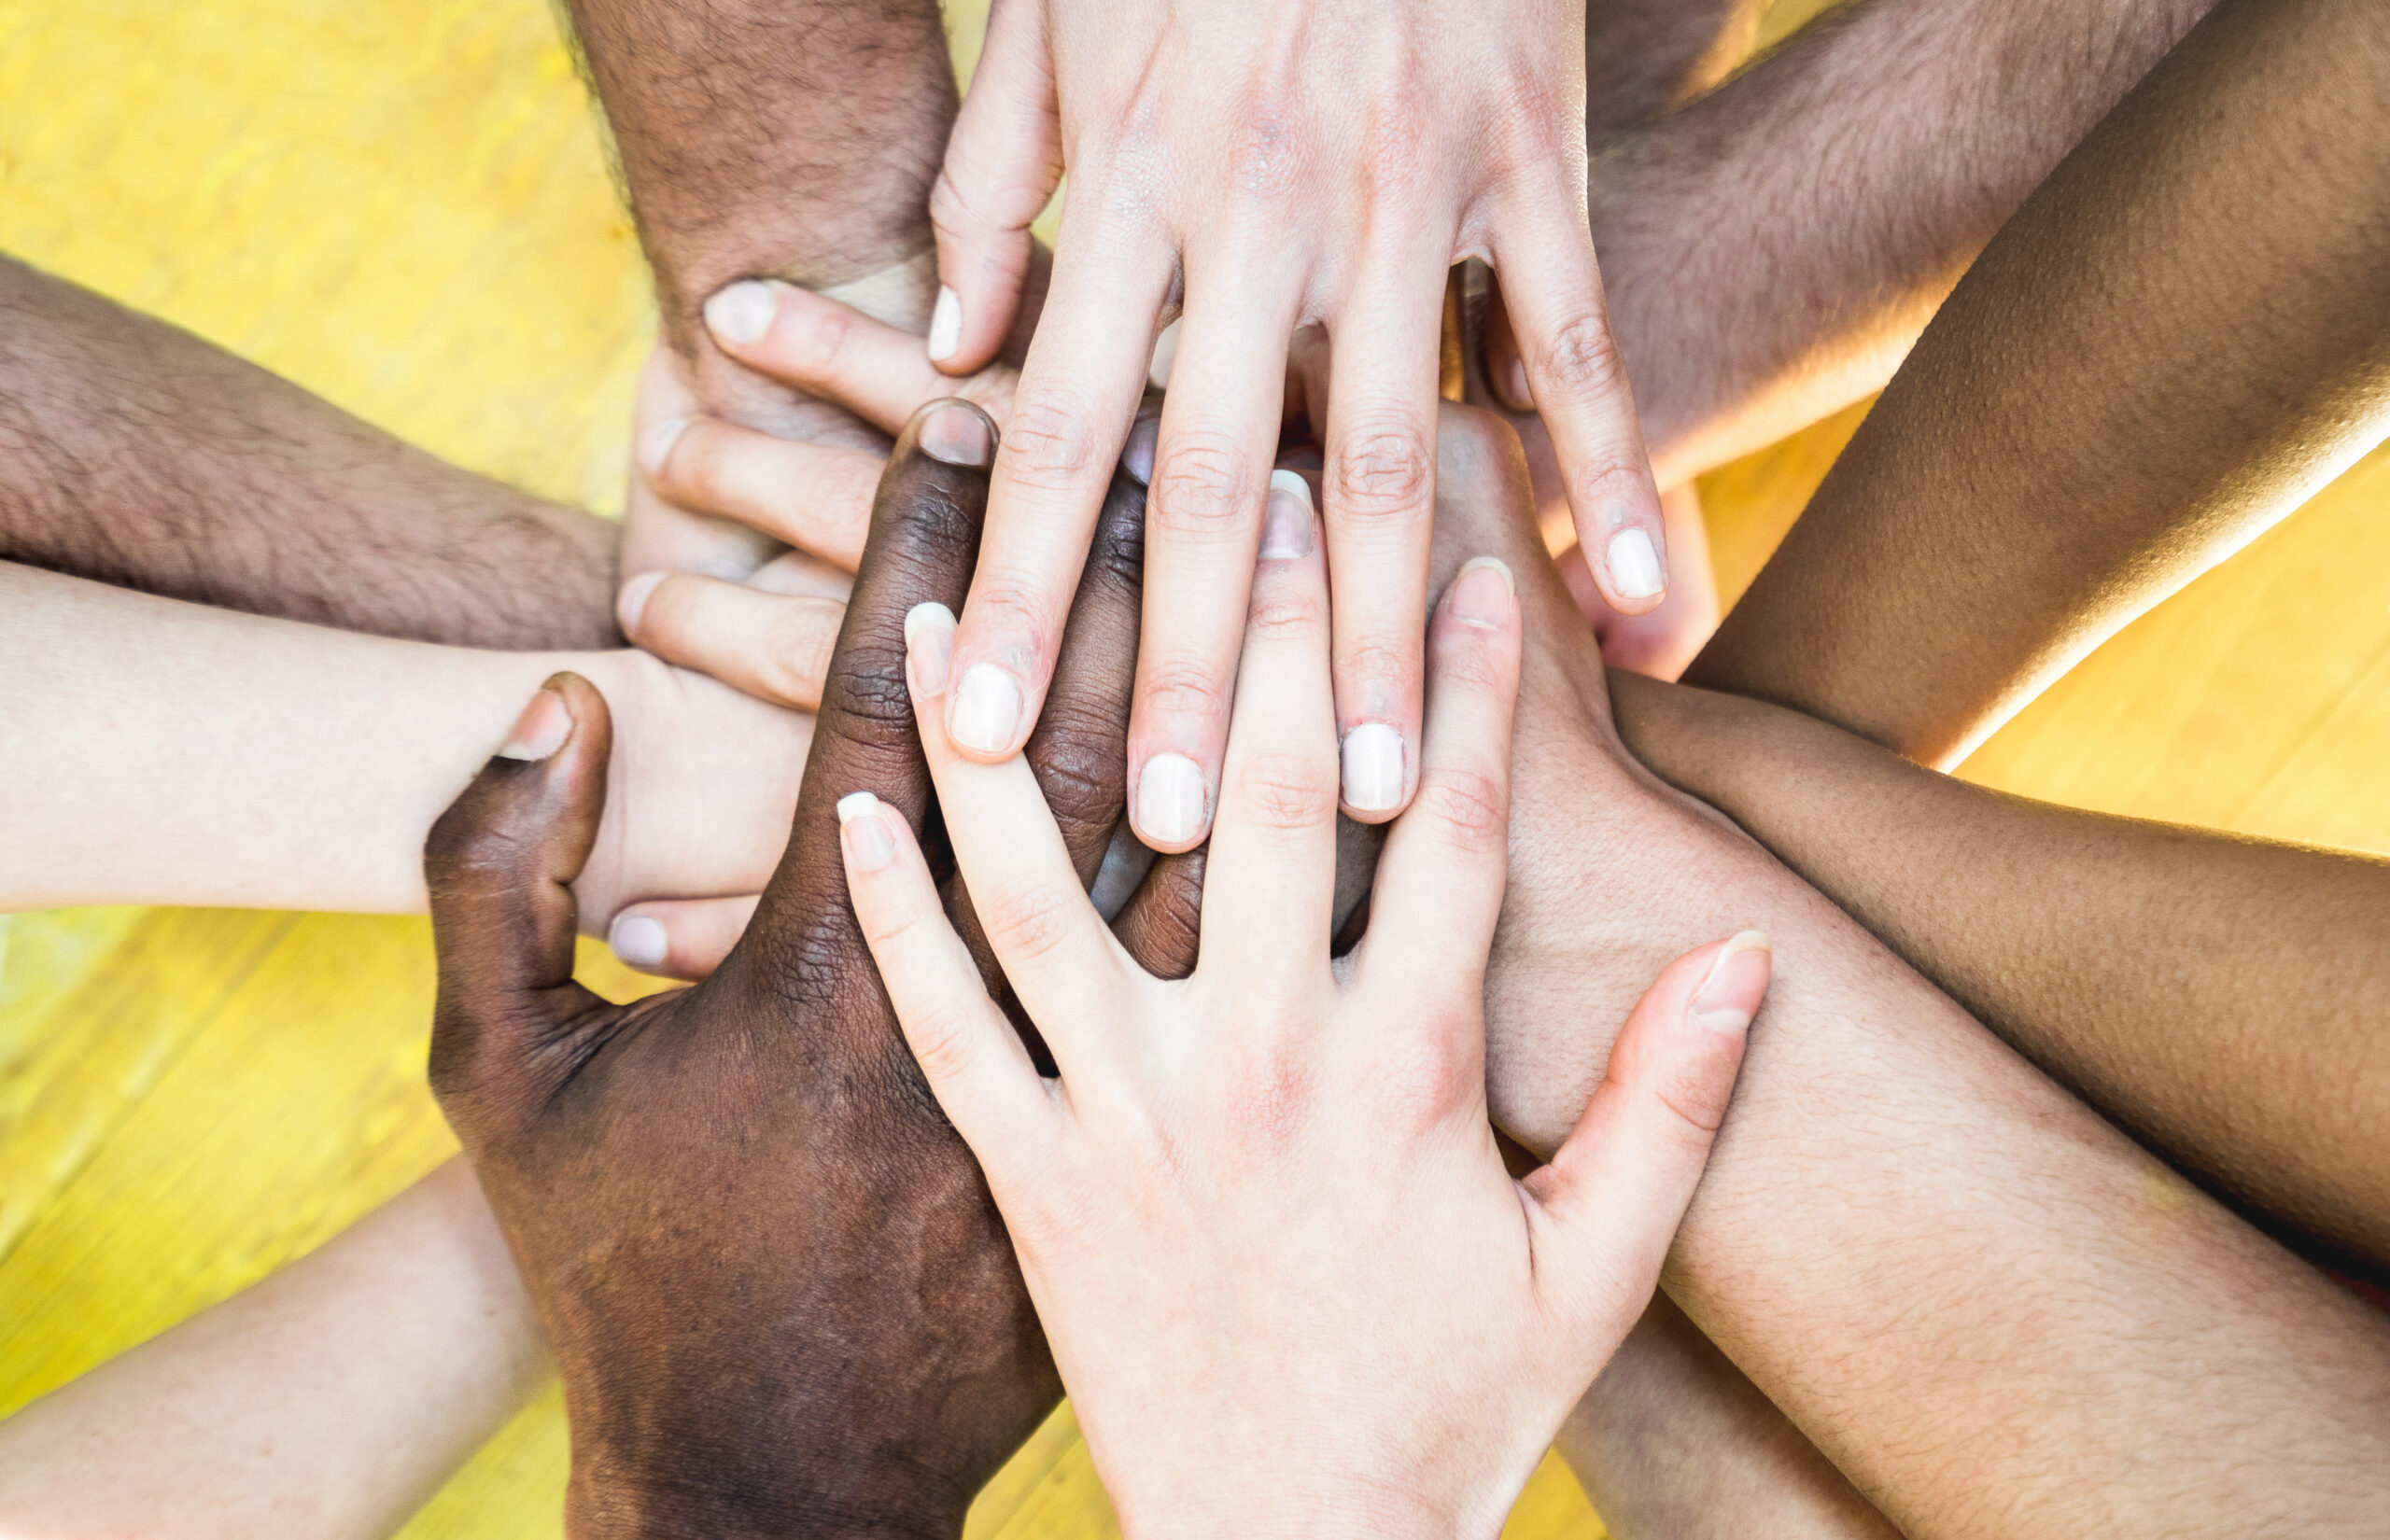 Mans de persones de diferents races